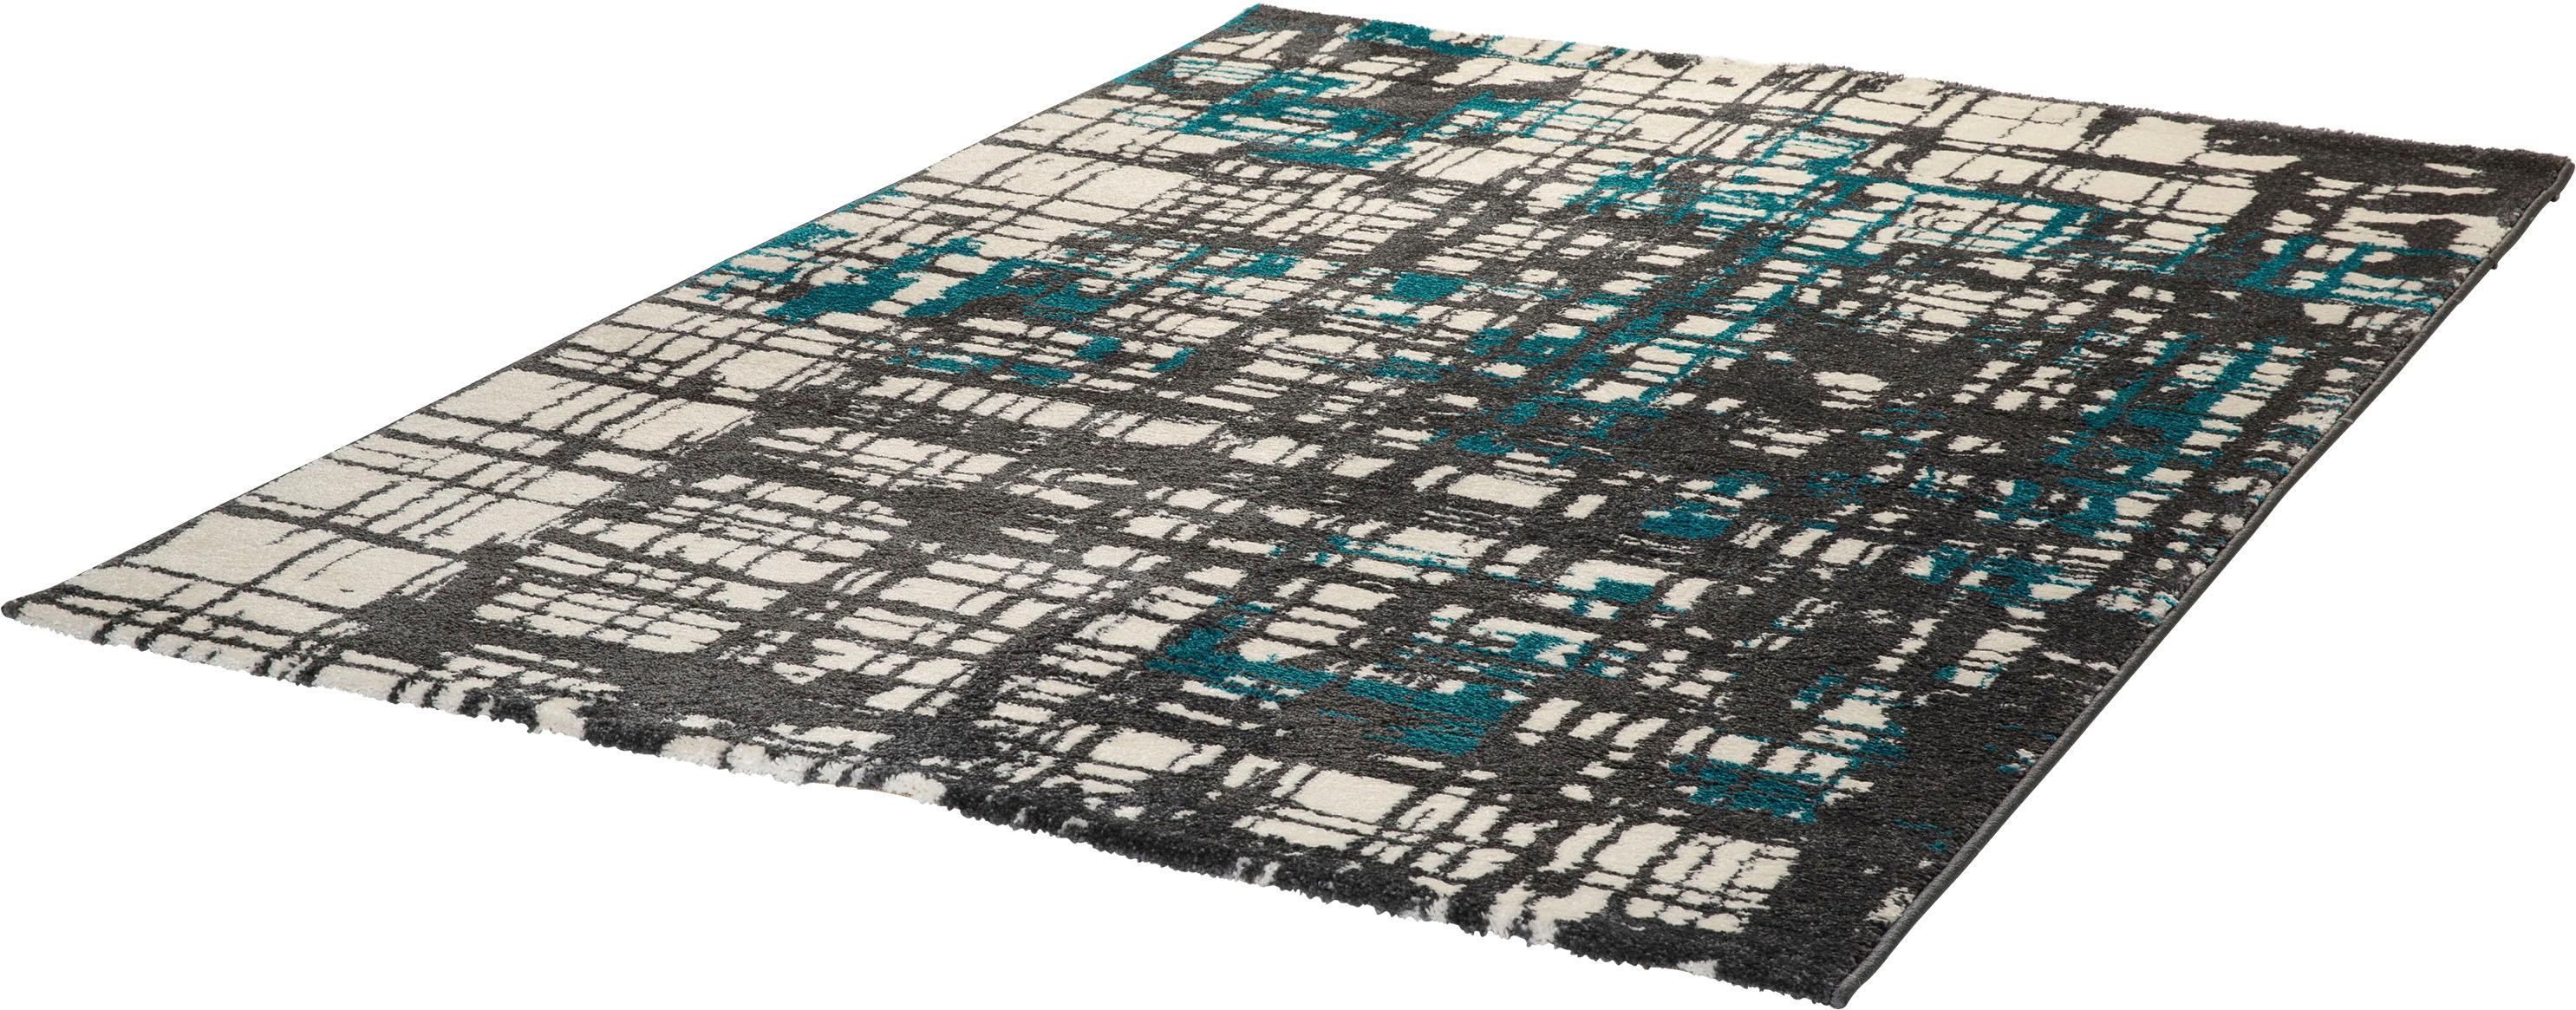 Teppich My Bronx 547 Obsession rechteckig Höhe 18 mm maschinell gewebt